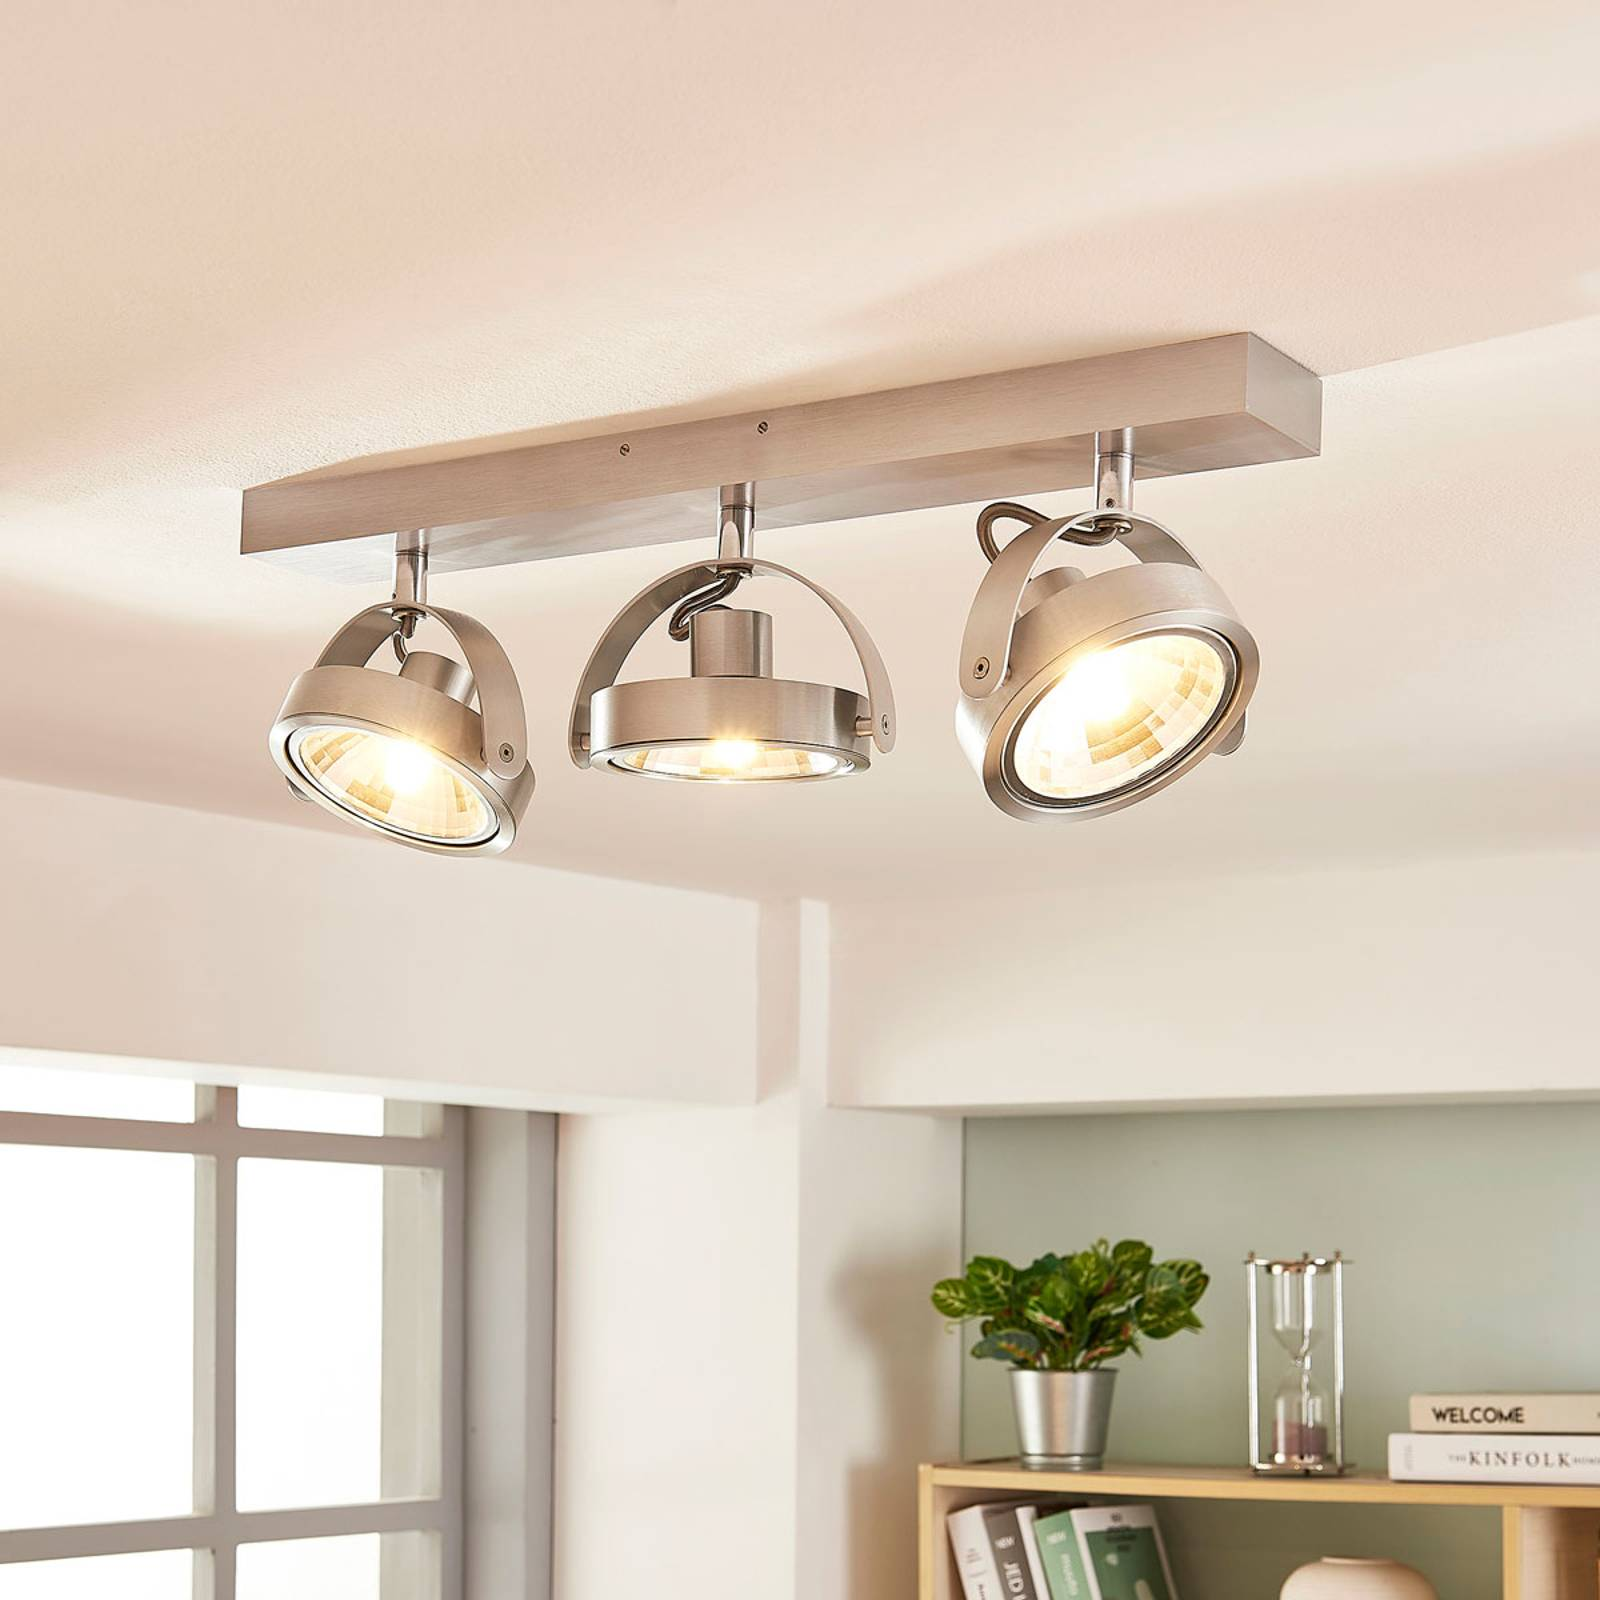 LED-Deckenstrahler Lieven aus Aluminium, 3-flammig